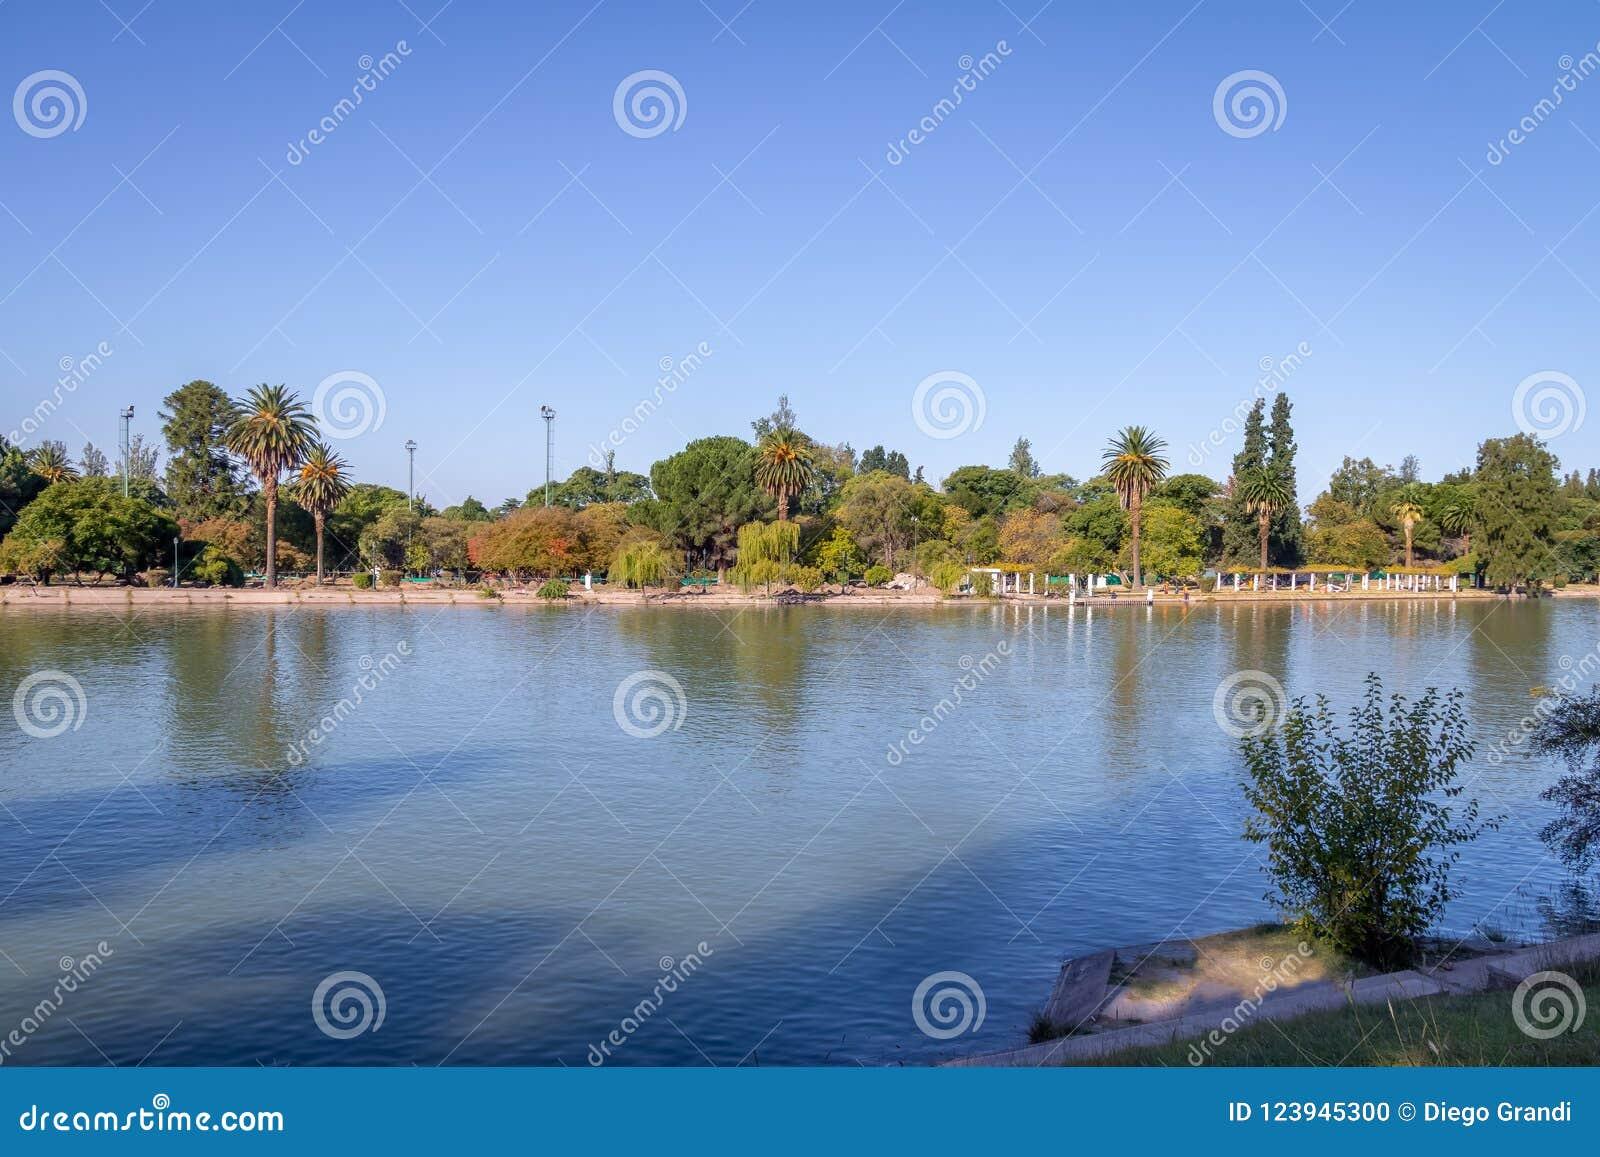 General San Martin Park Lake - Mendoza, Argentina